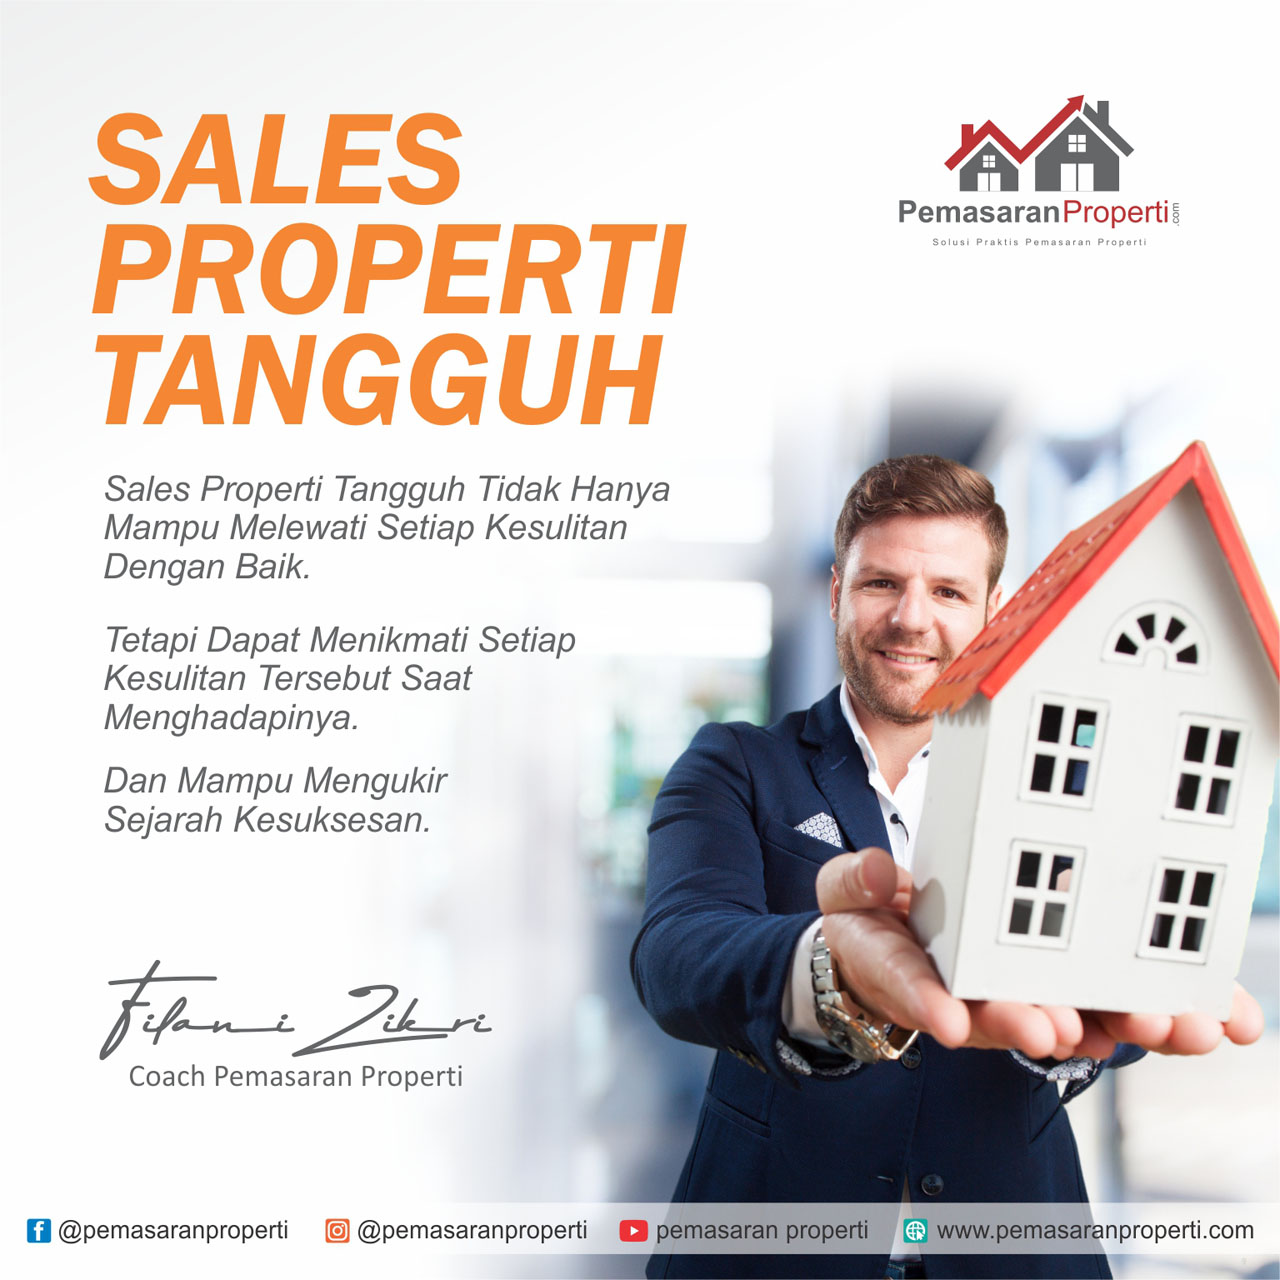 sales properti tangguh